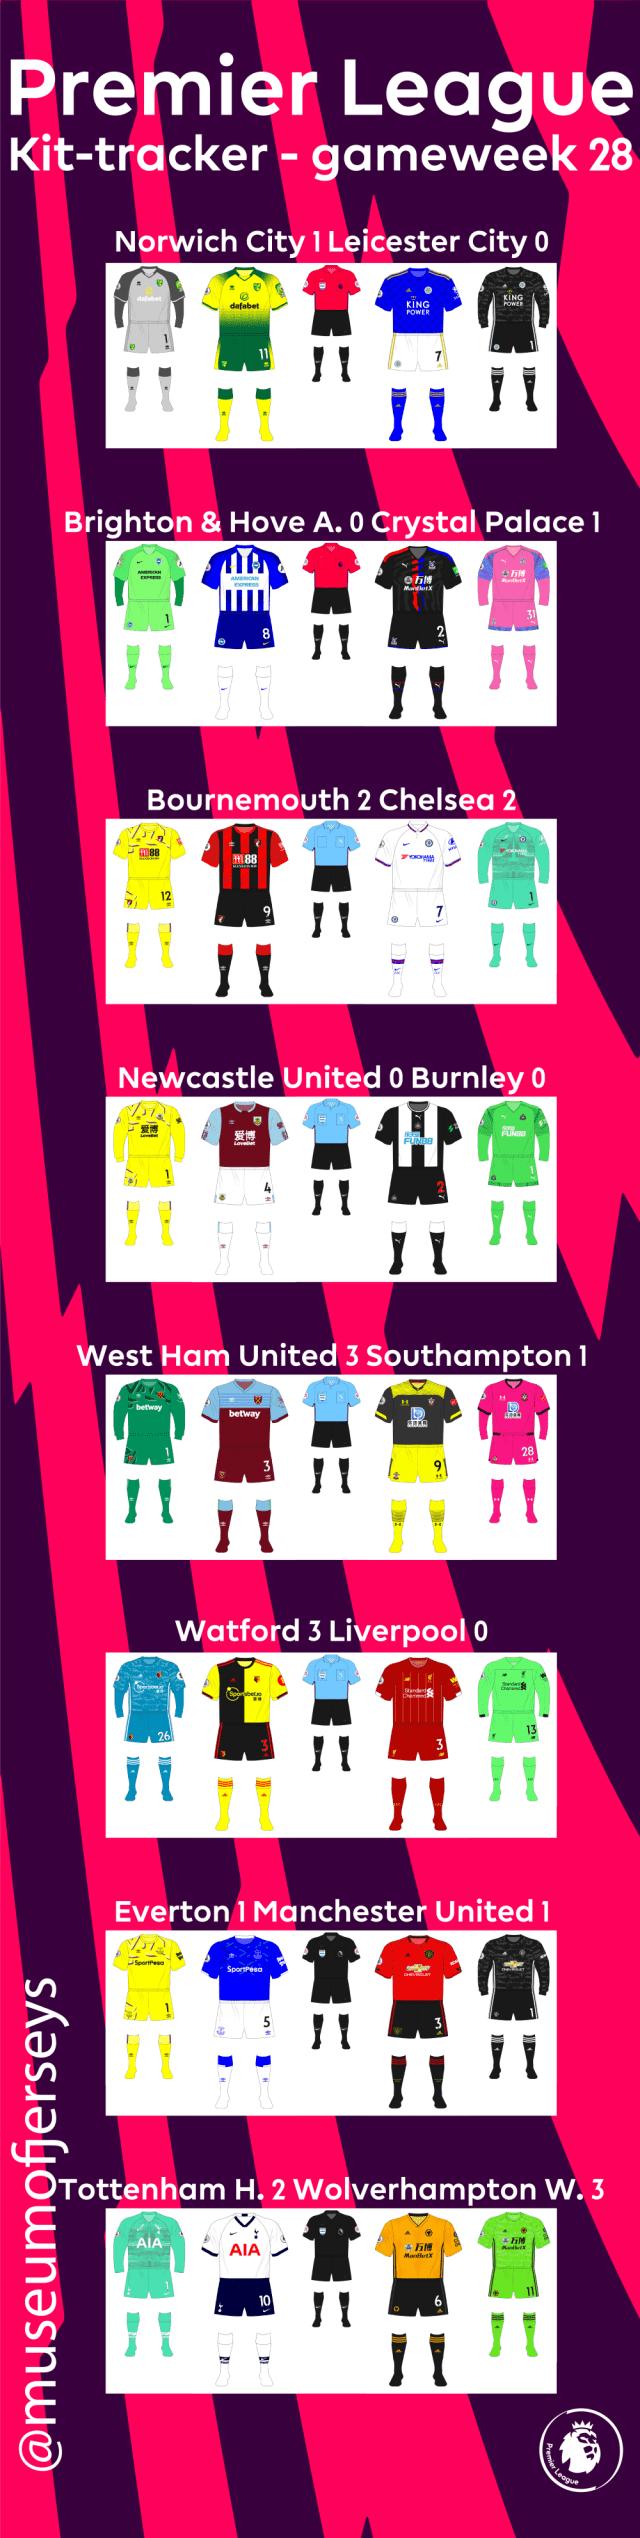 2019-2020-Premier-League-Kit-Tracker-Gameweek-28-01